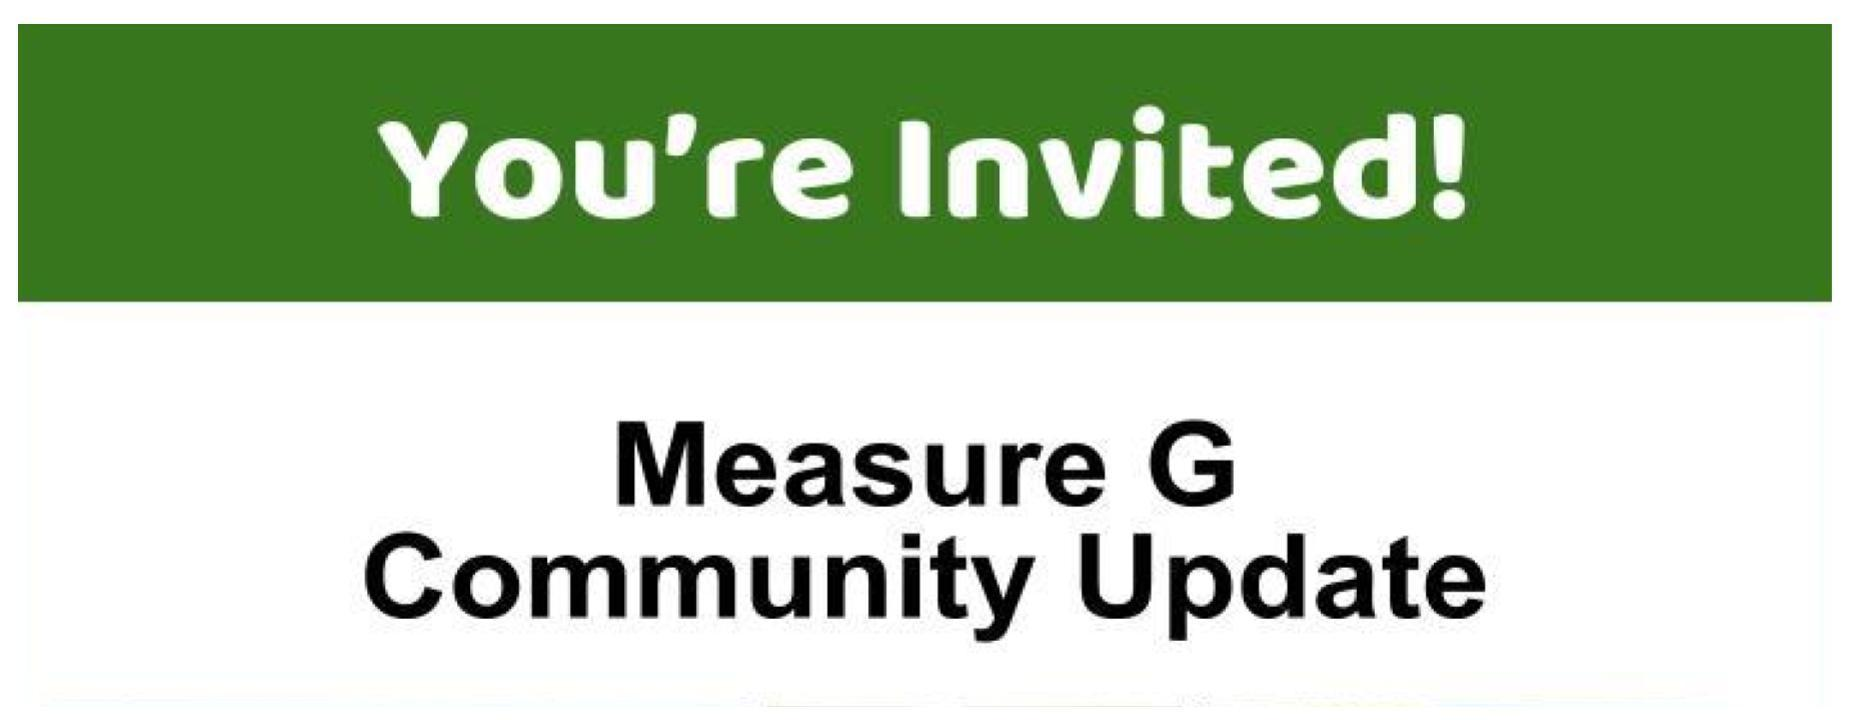 measure g community update information